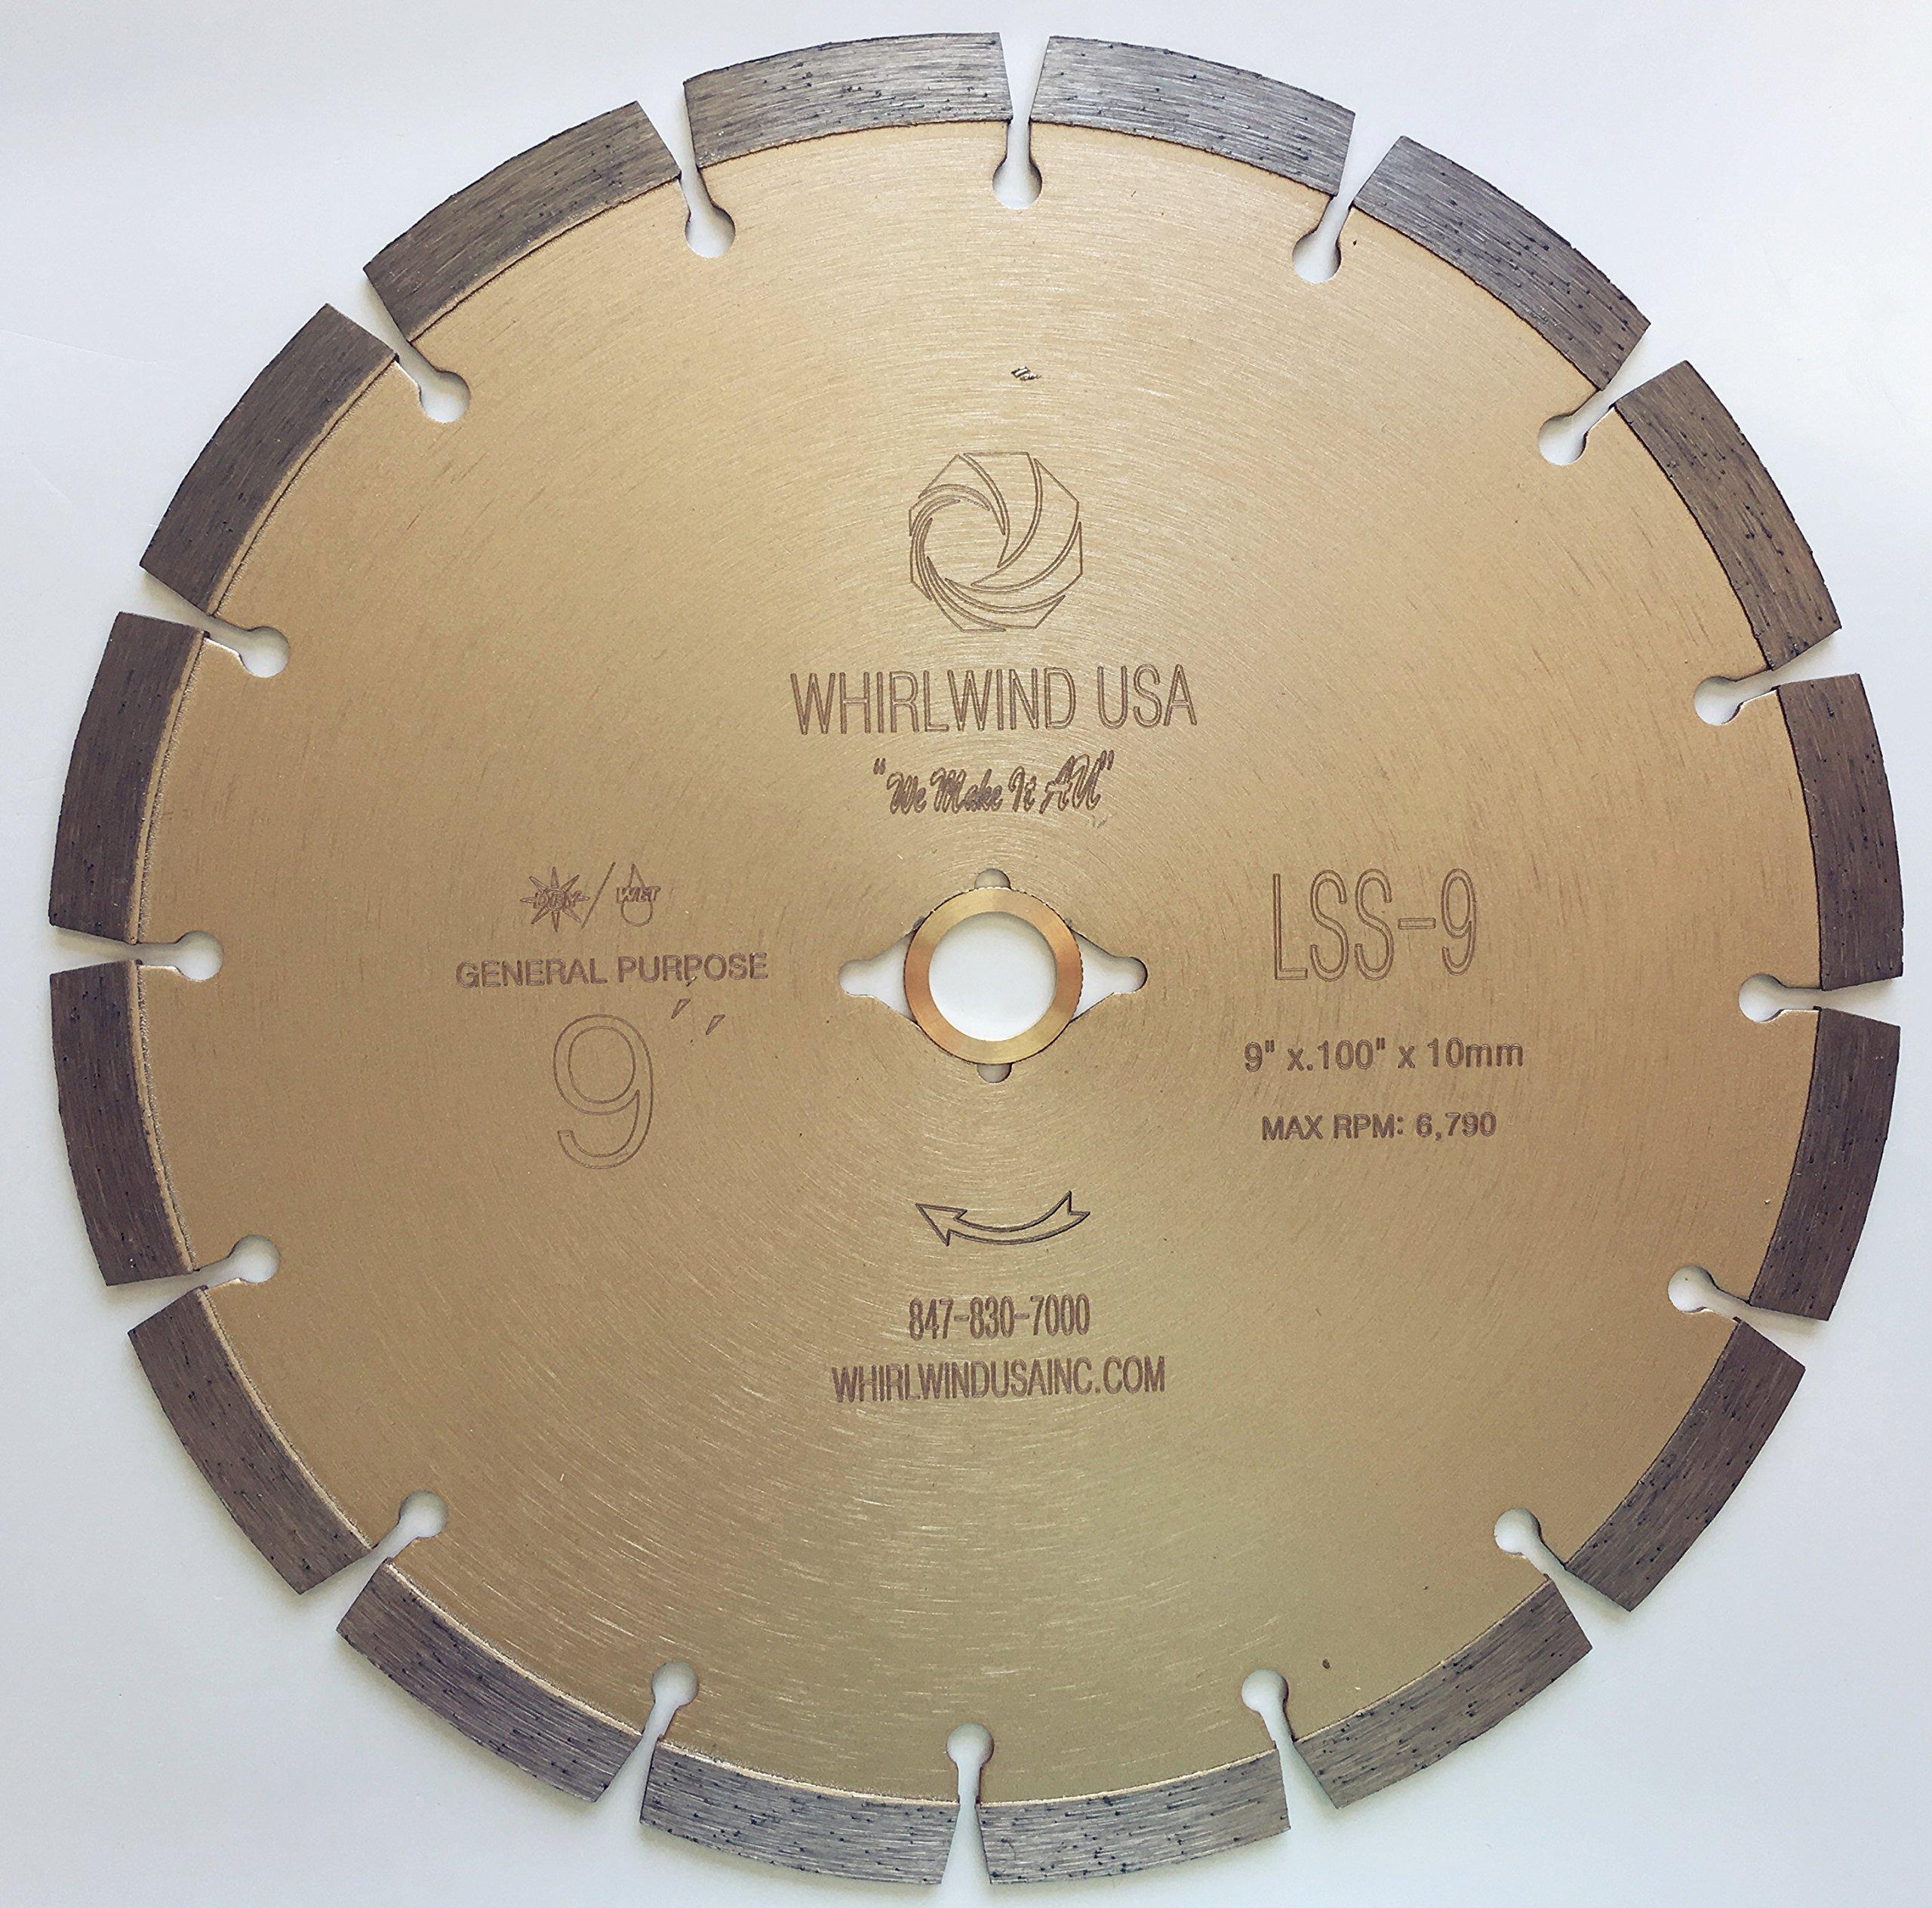 Whirlwind USA LSS 9 inch Dry or Wet Cutting General Purpose Power Saw Segmented Diamond Blades for Masonry Brick/Block Pavers Concrete Stone (9'')